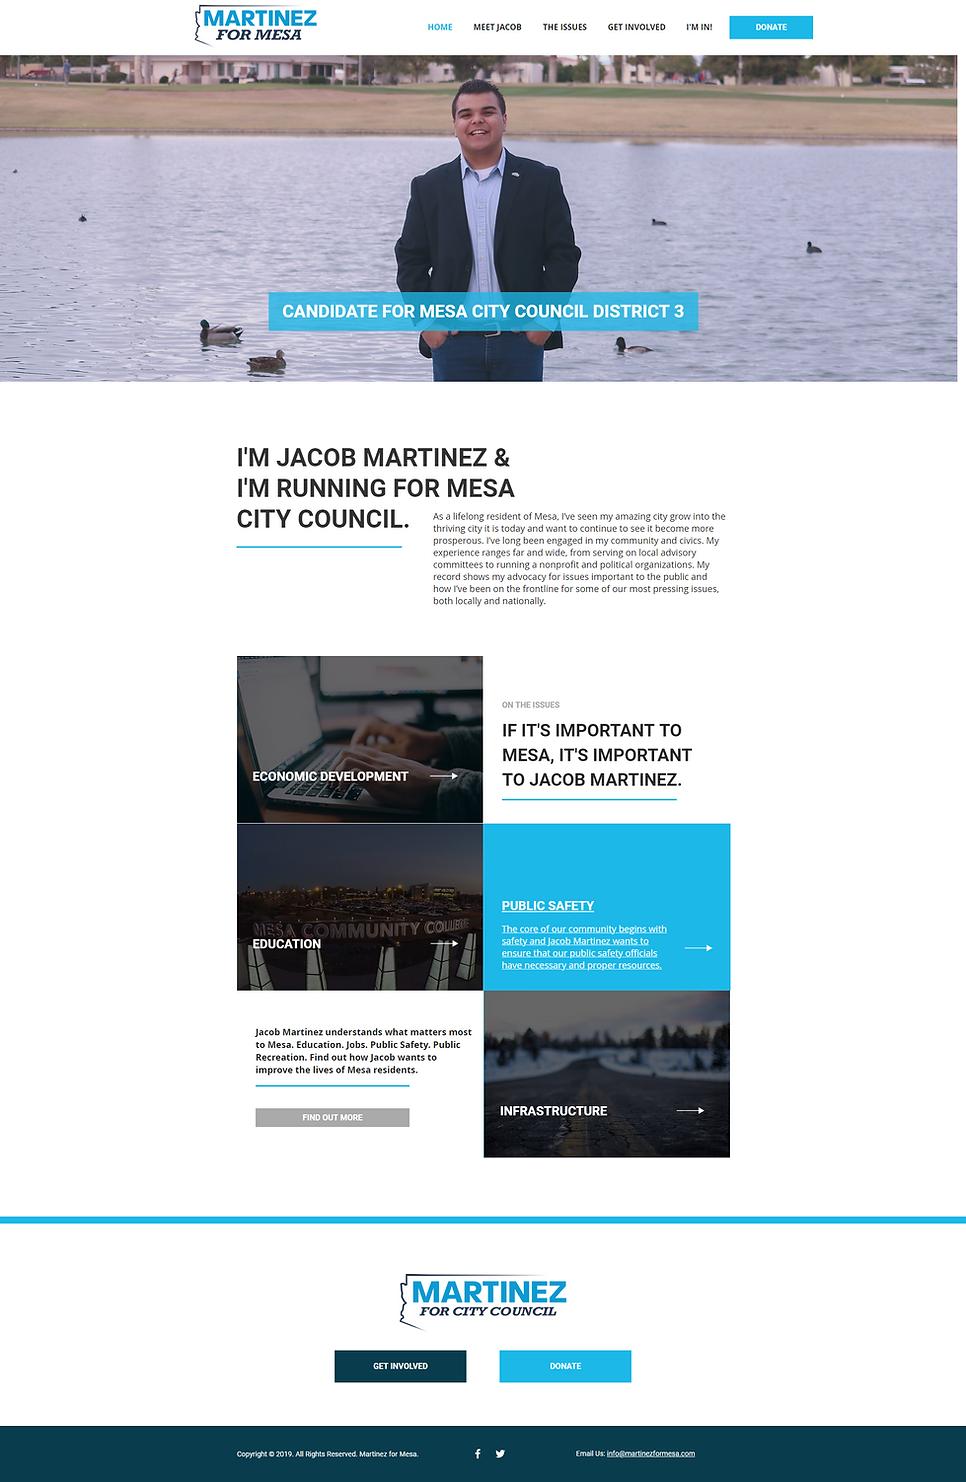 screencapture-martinezformesa-2019-03-24